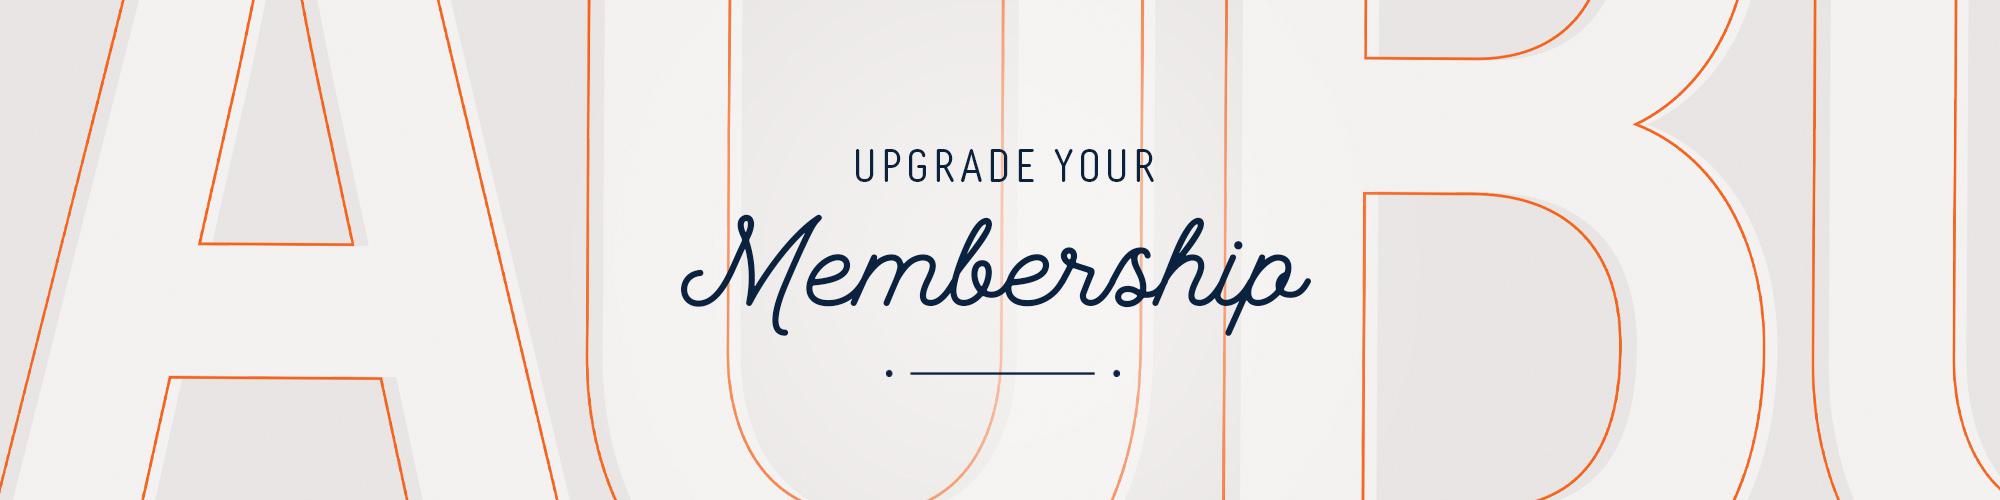 Upgrade Membership Graphic